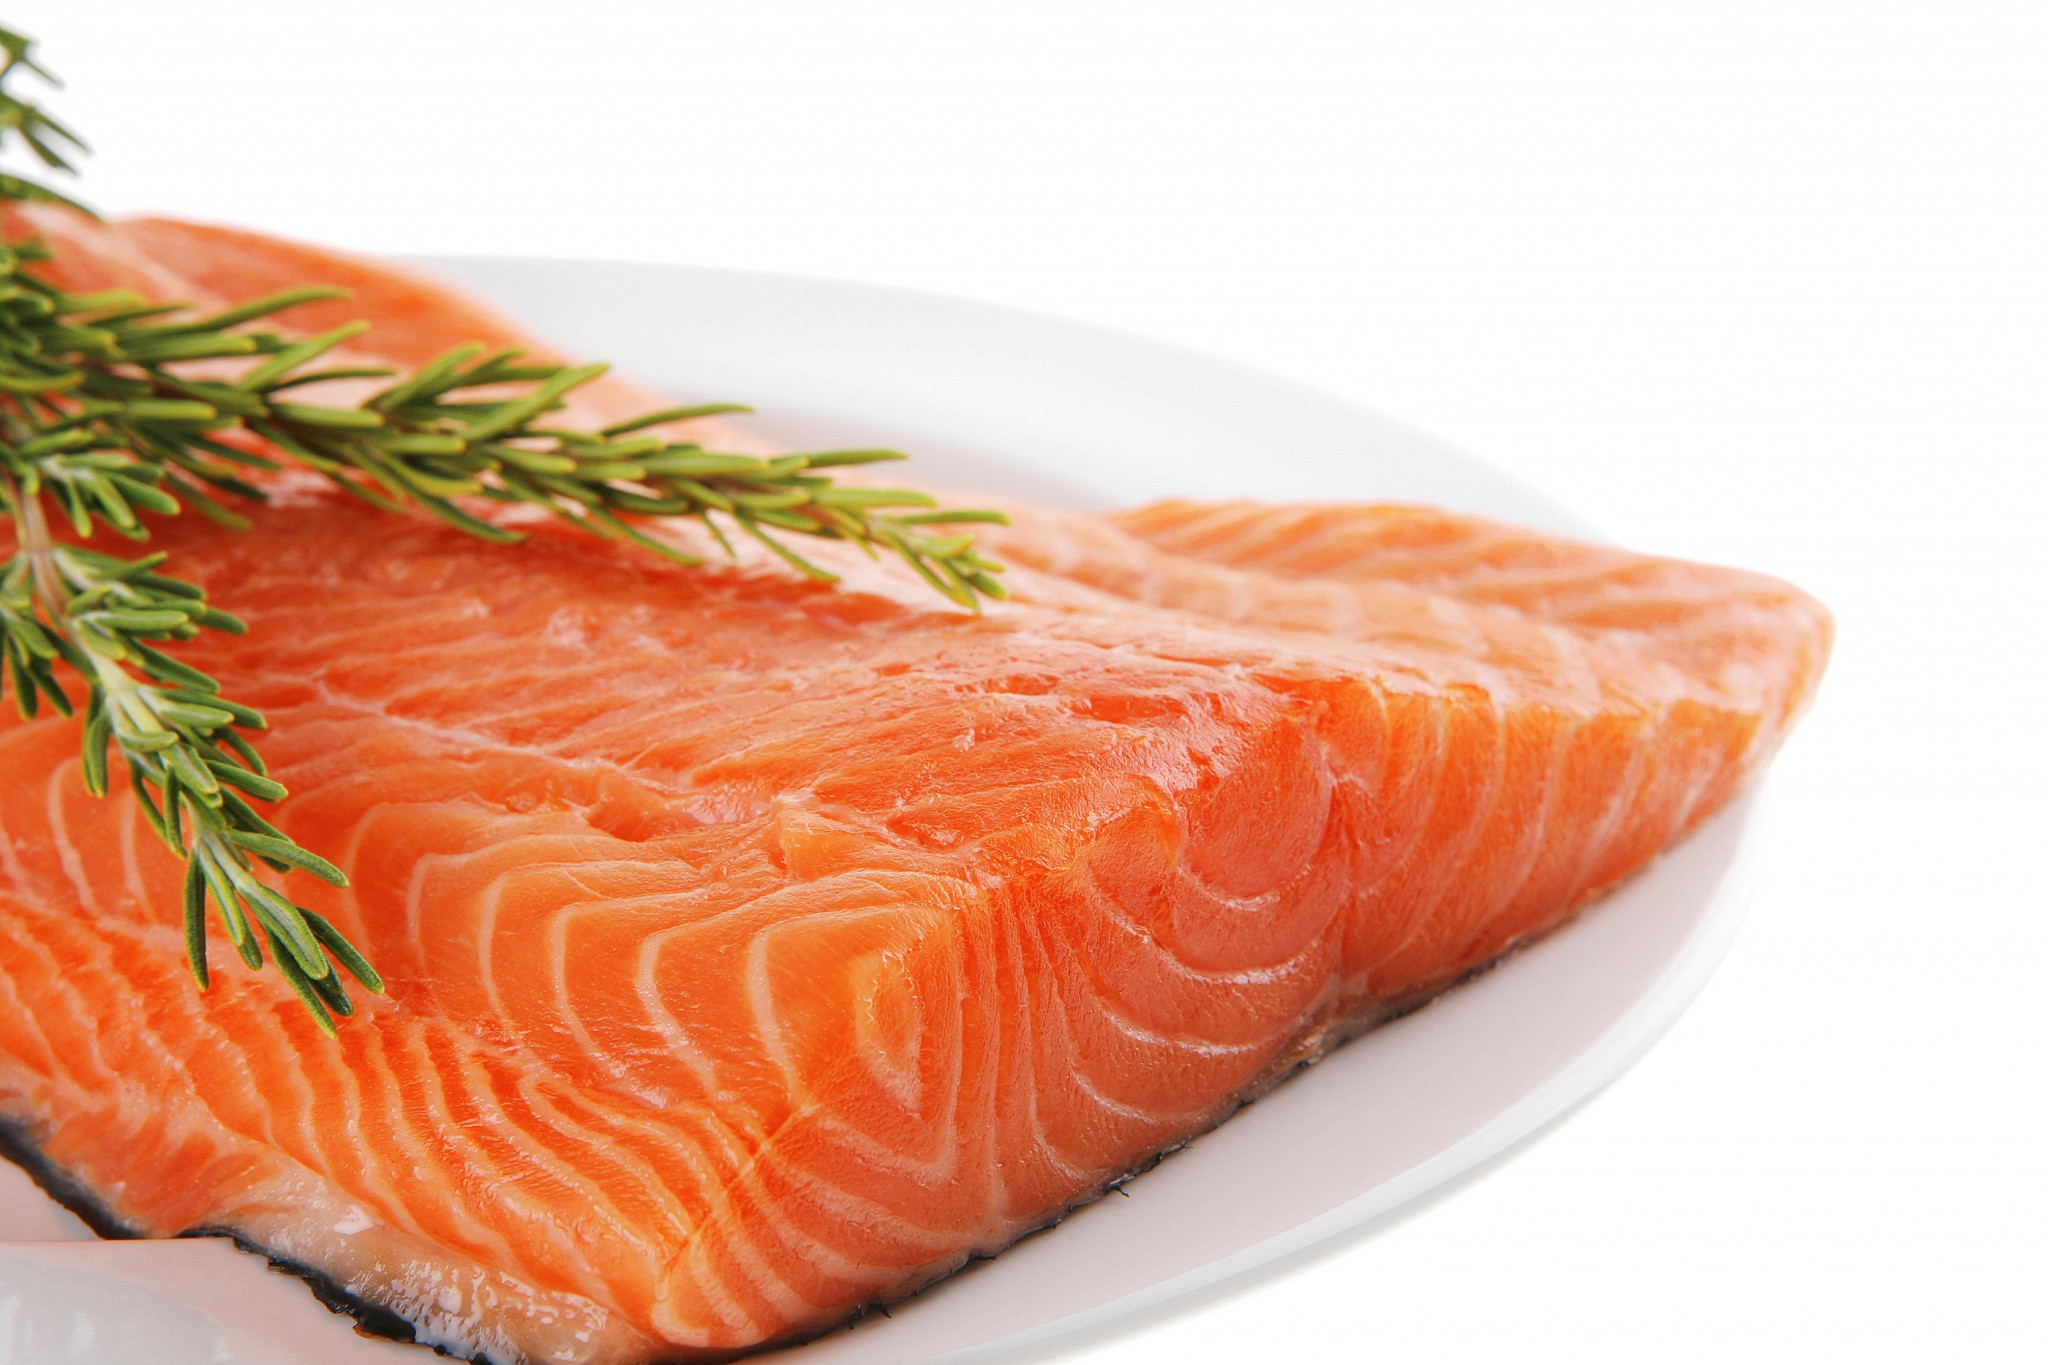 Raw clipart fish fillet Photo#8 Fillet fish Raw fillet